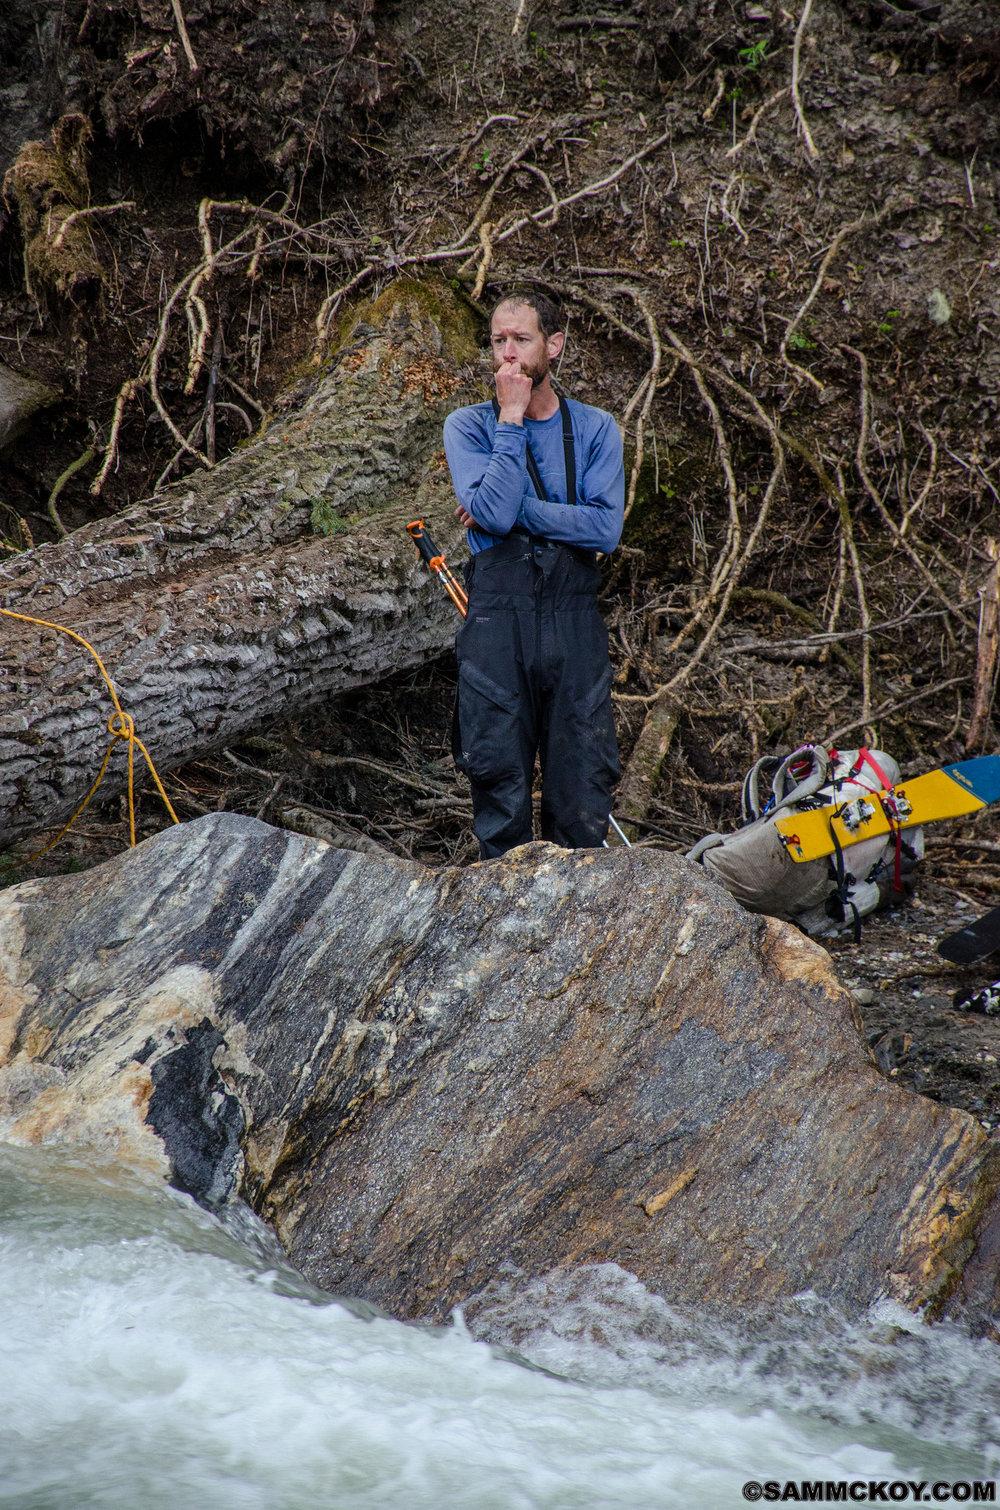 Mark observing as Madeleine cross the log.